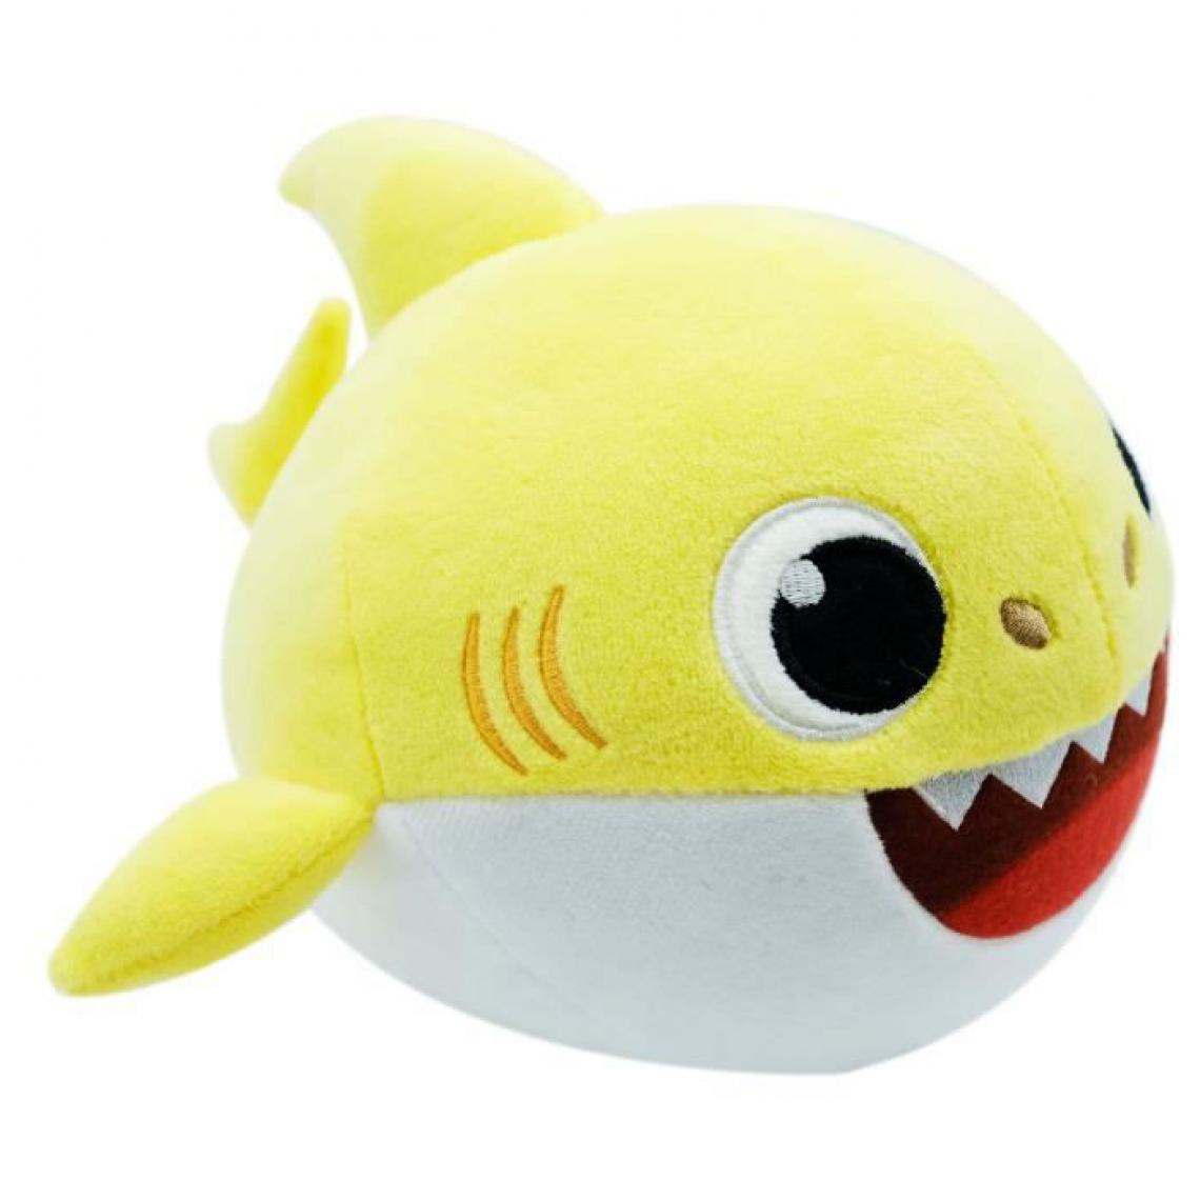 Banaline Baby Shark - Peluche Baby Shark danse et chante - bébé requin - Jaune